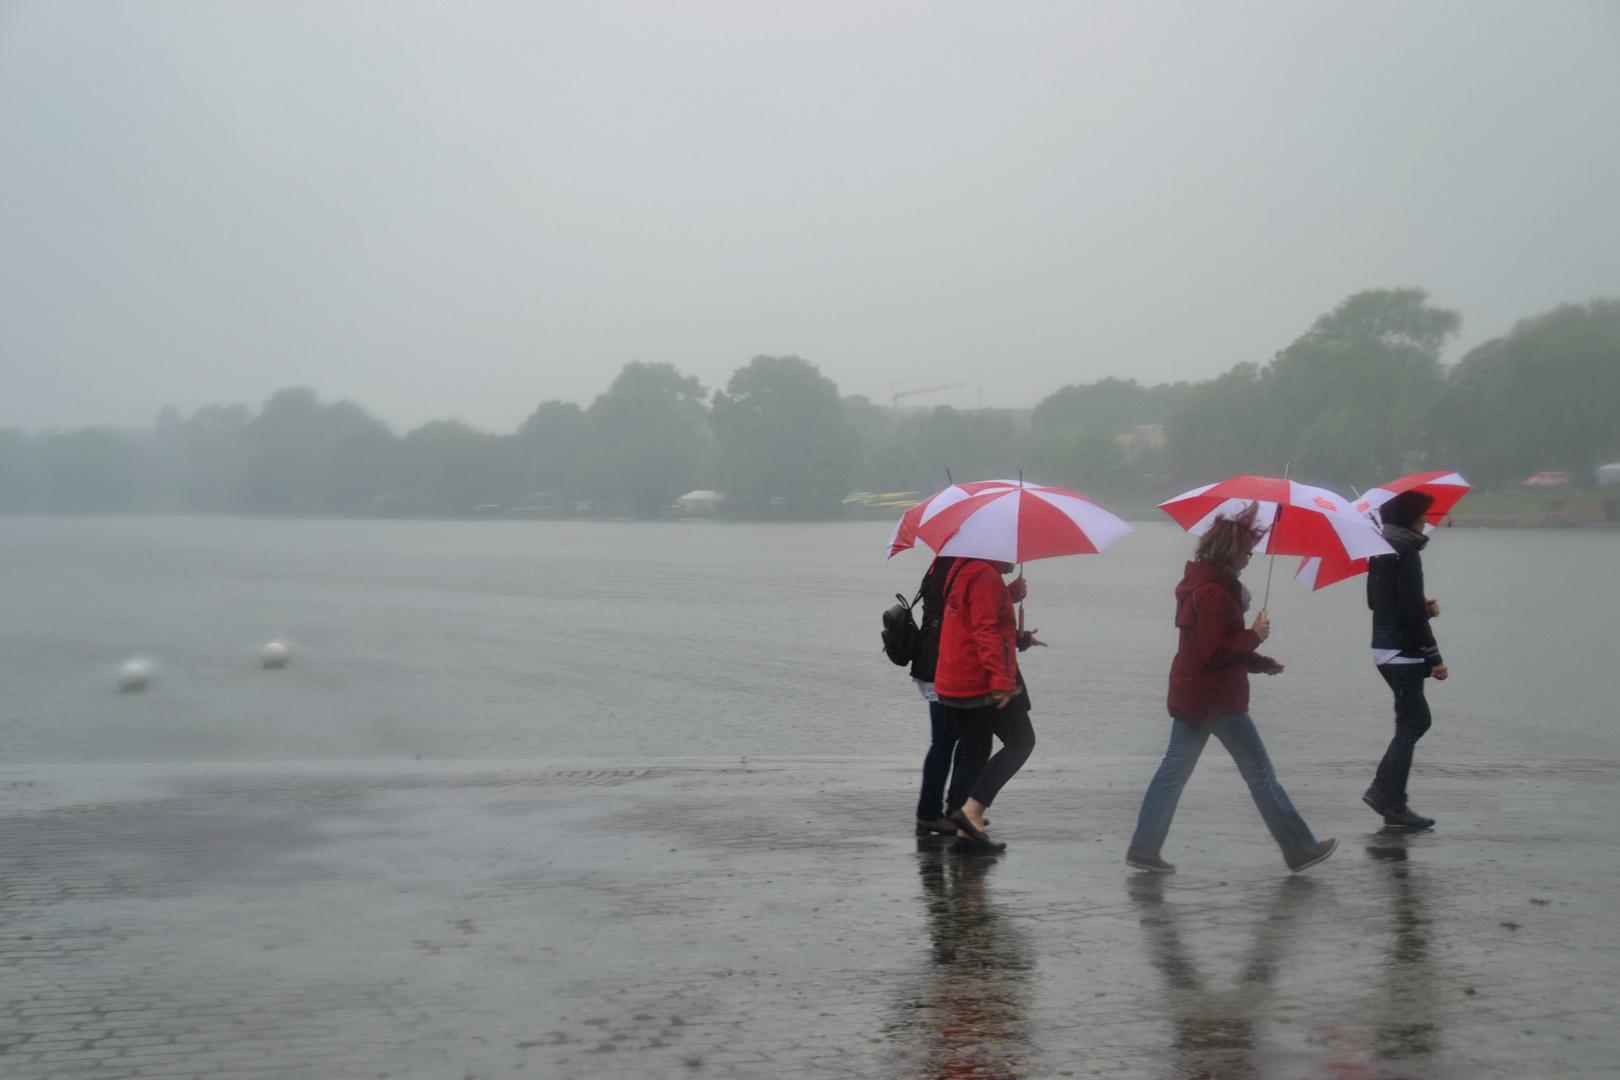 Aasee bei Regen